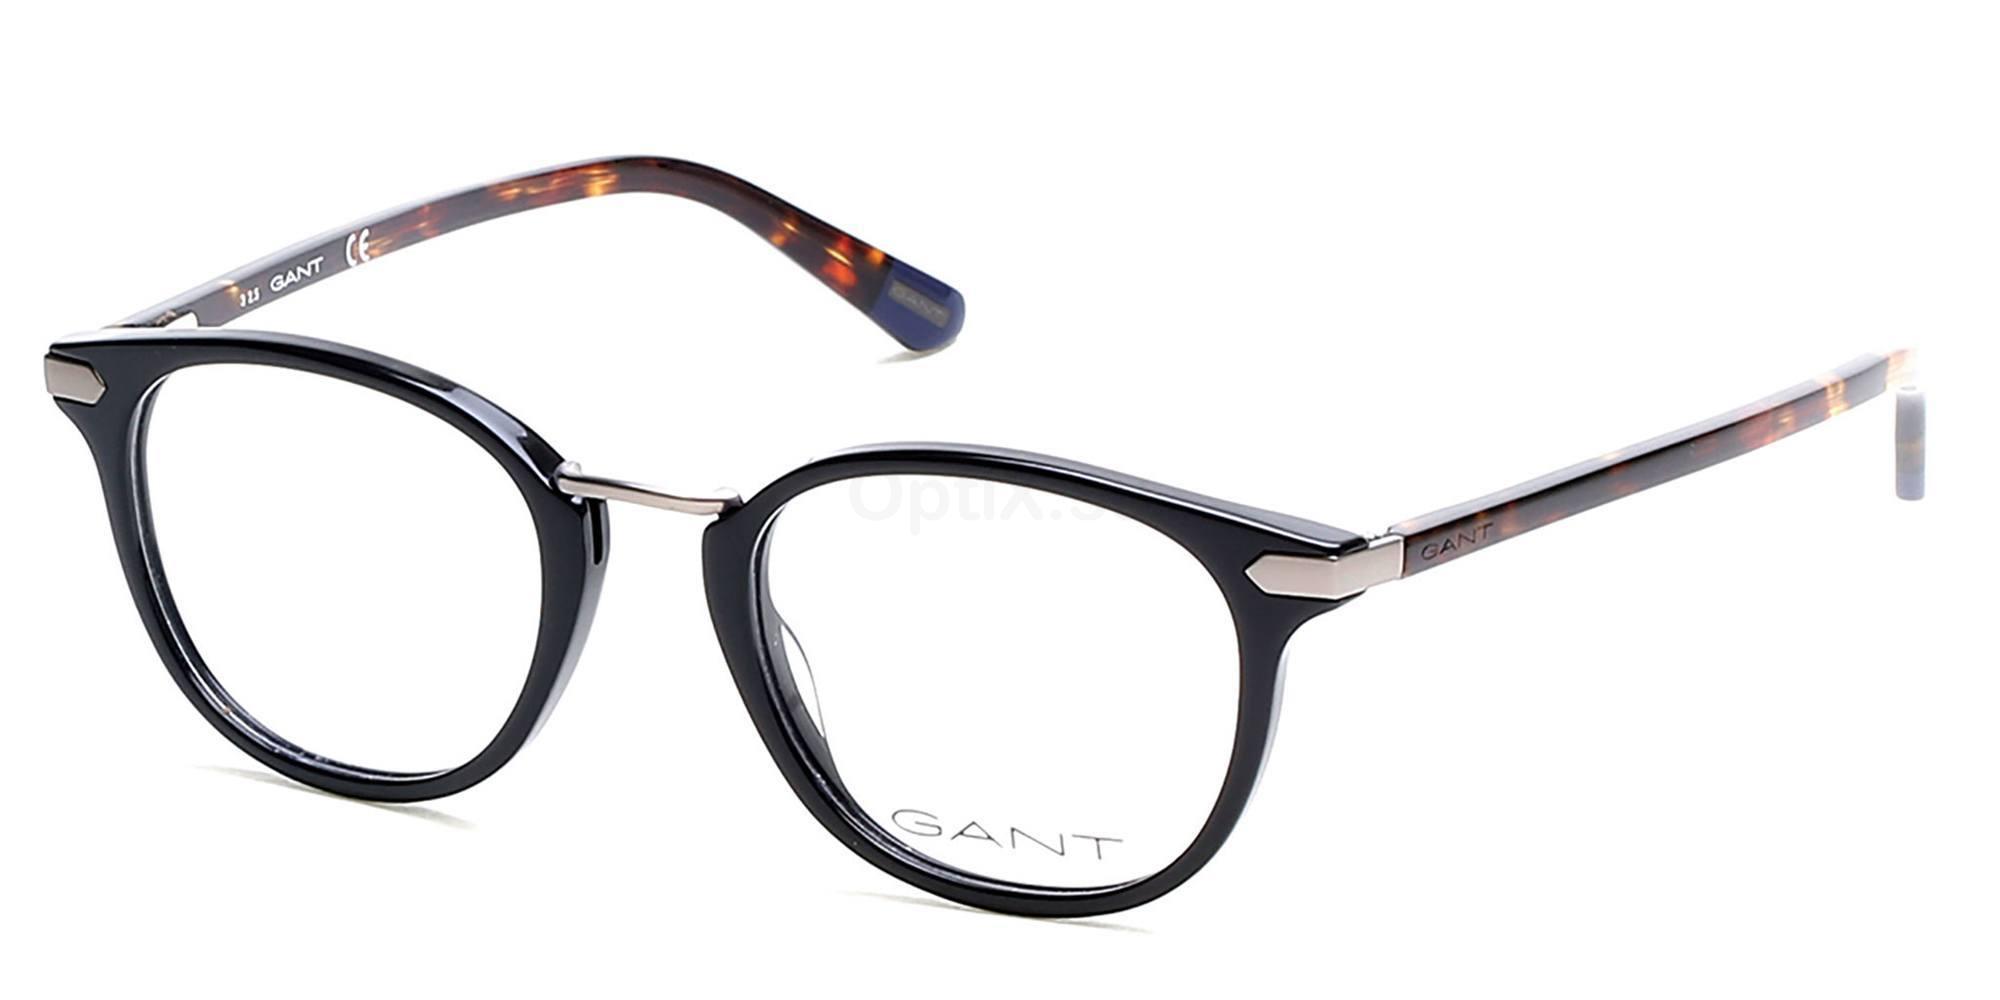 001 GA3115 , Gant